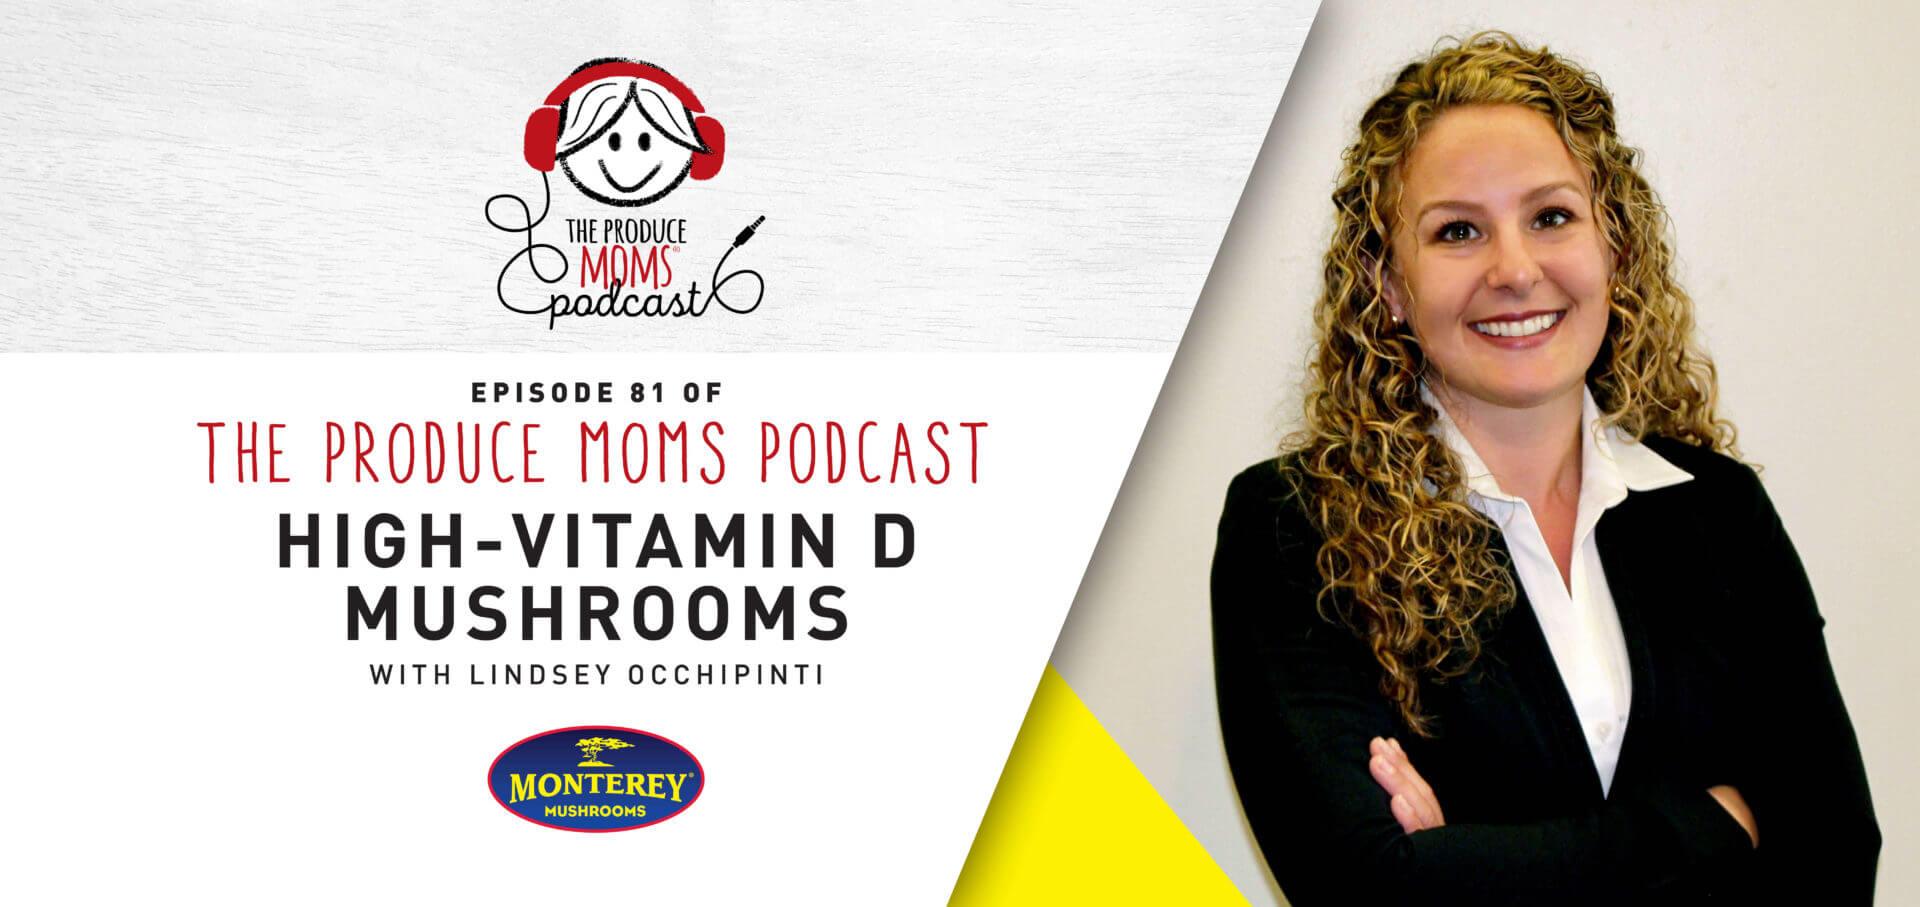 TPM Podcast Lindsey Occhipini